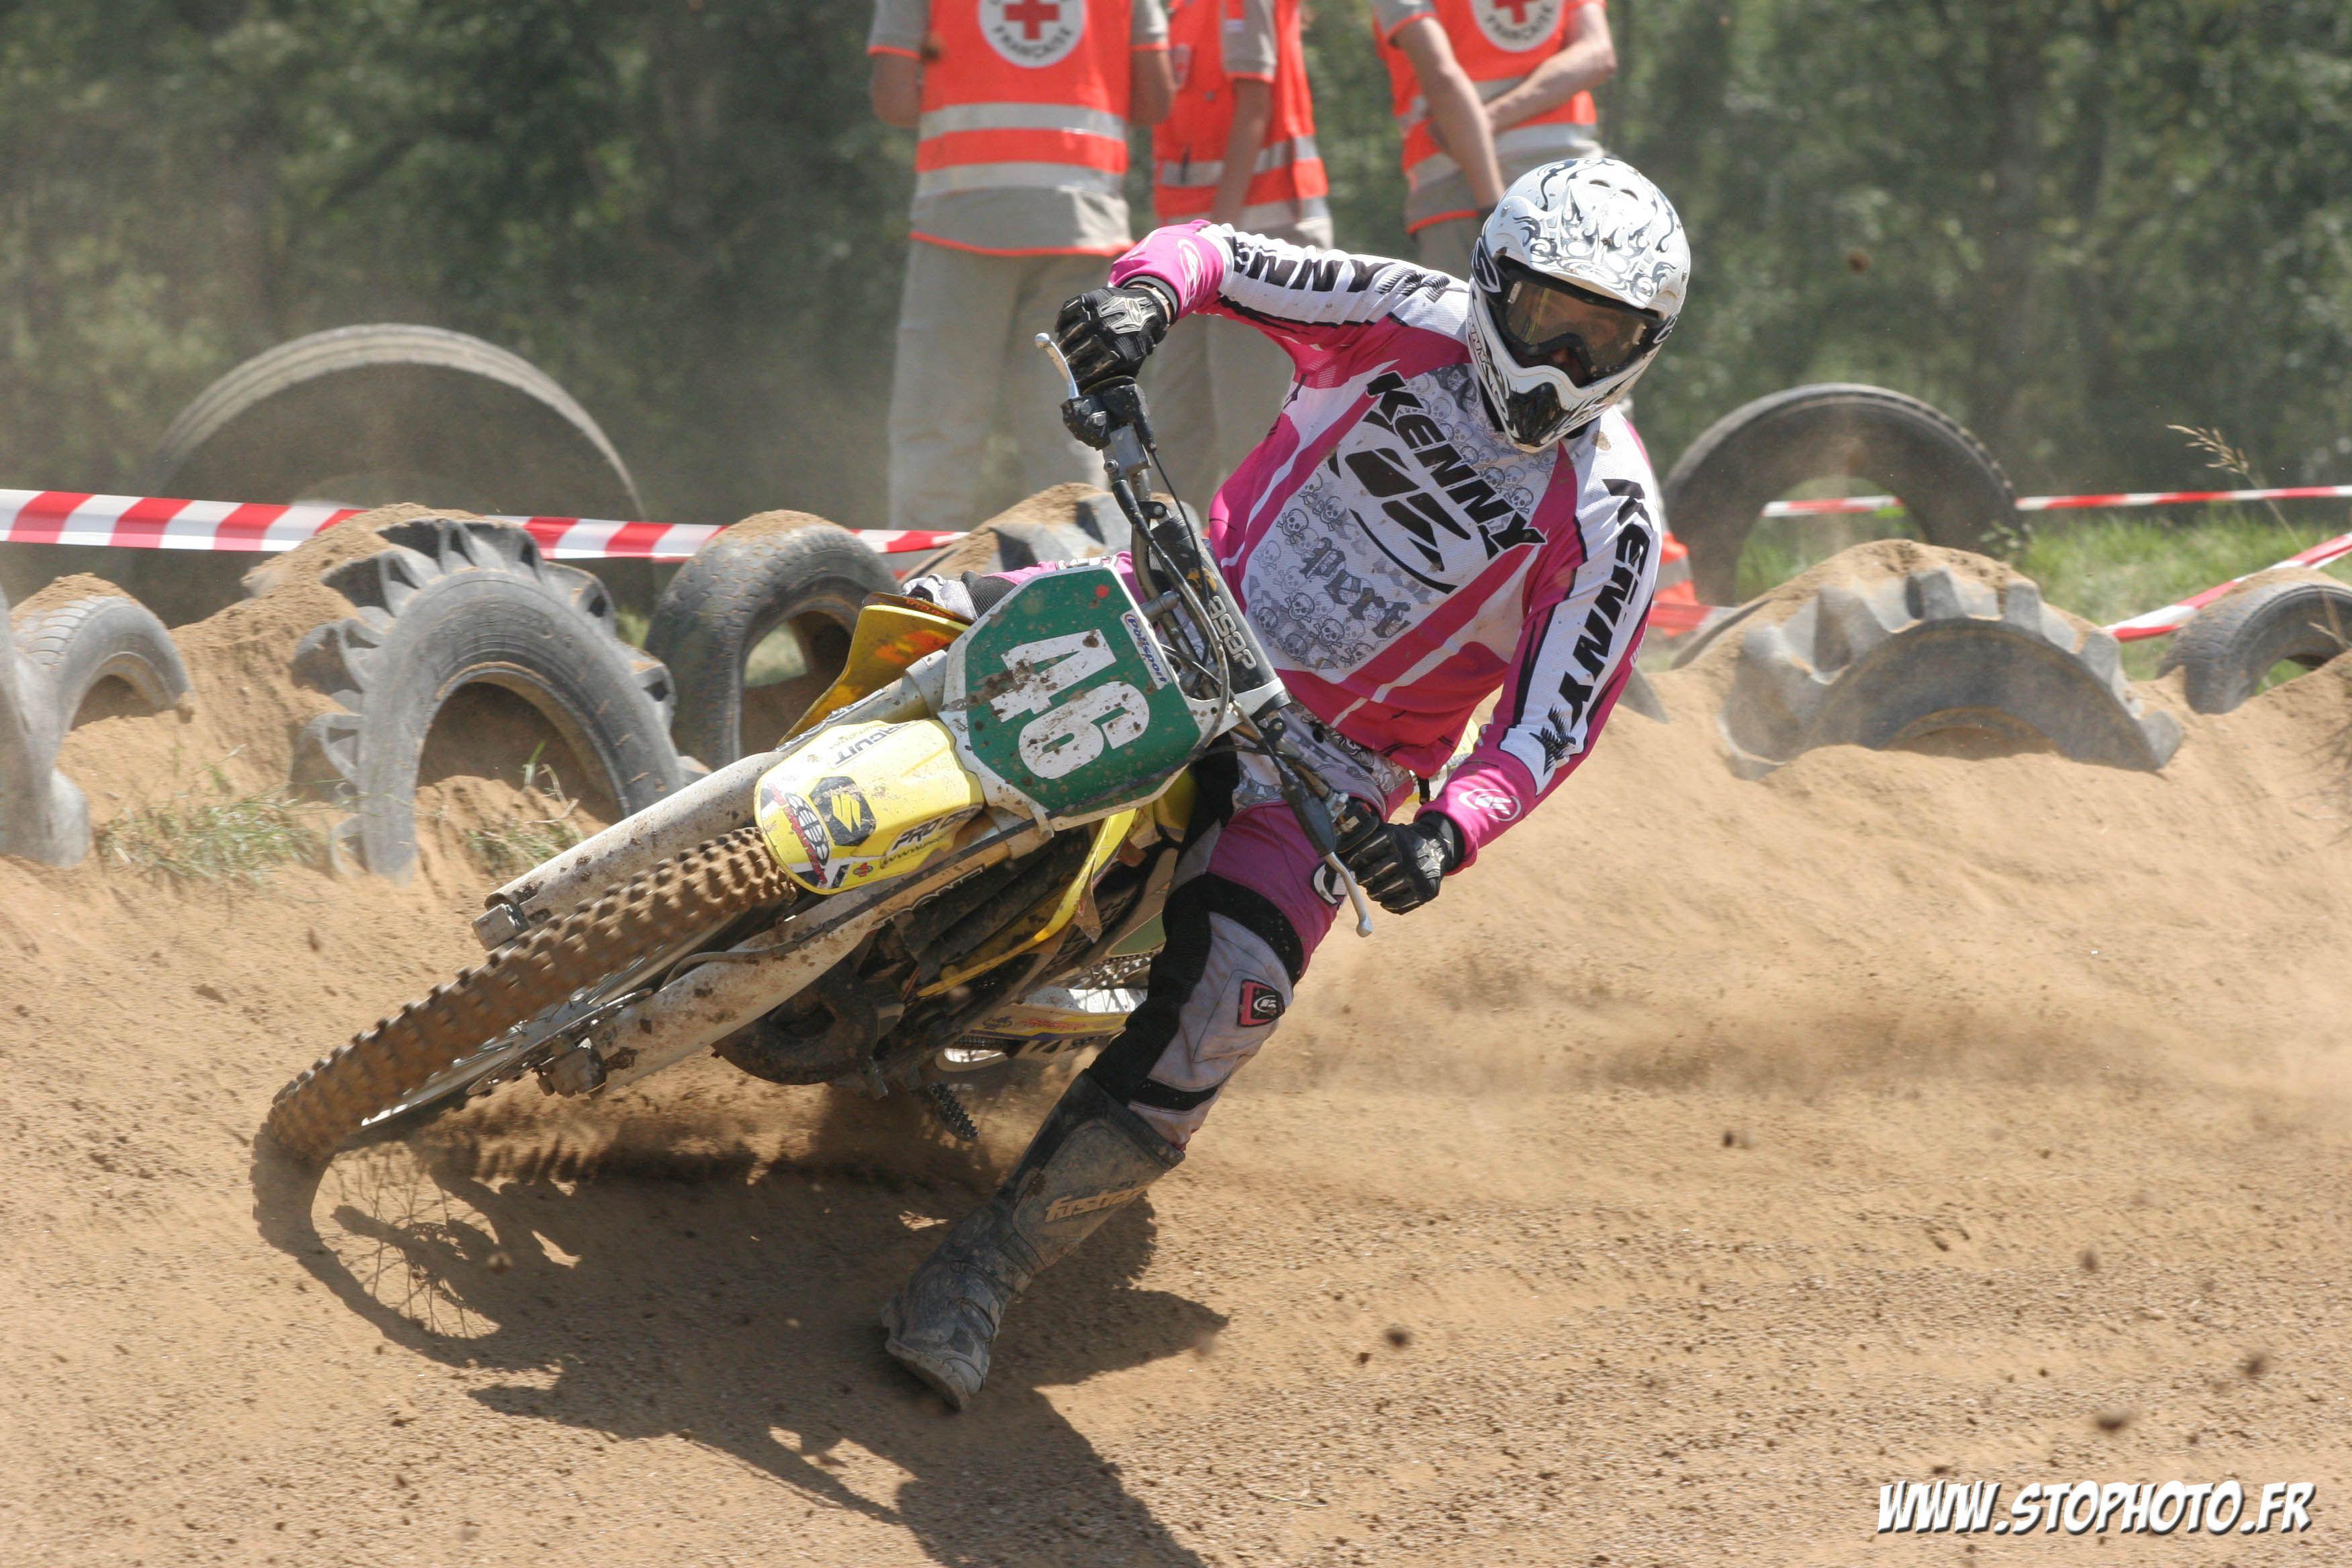 Circuit moto-cross Patrick Servat